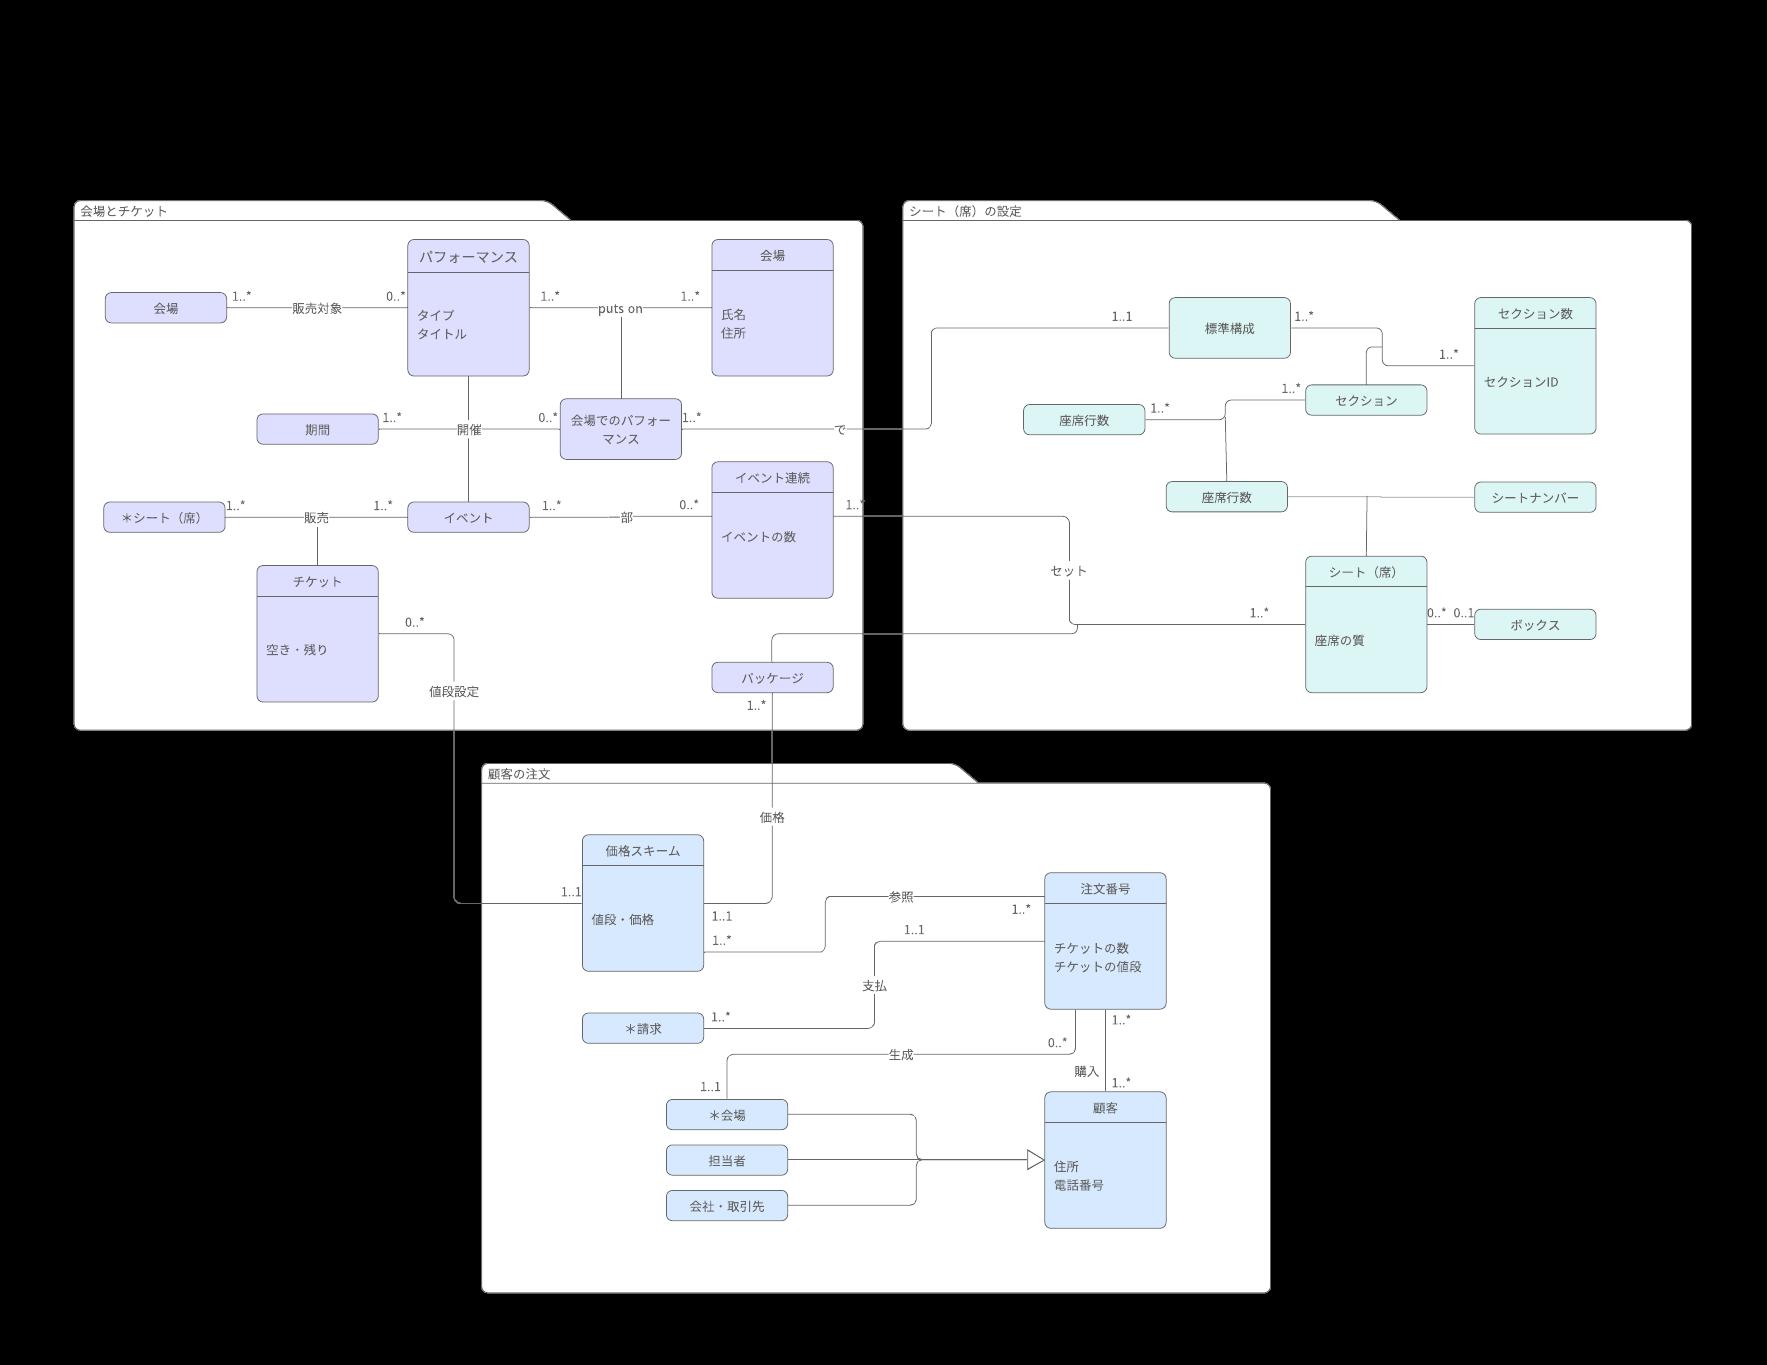 UMLクラス図例とテンプレート